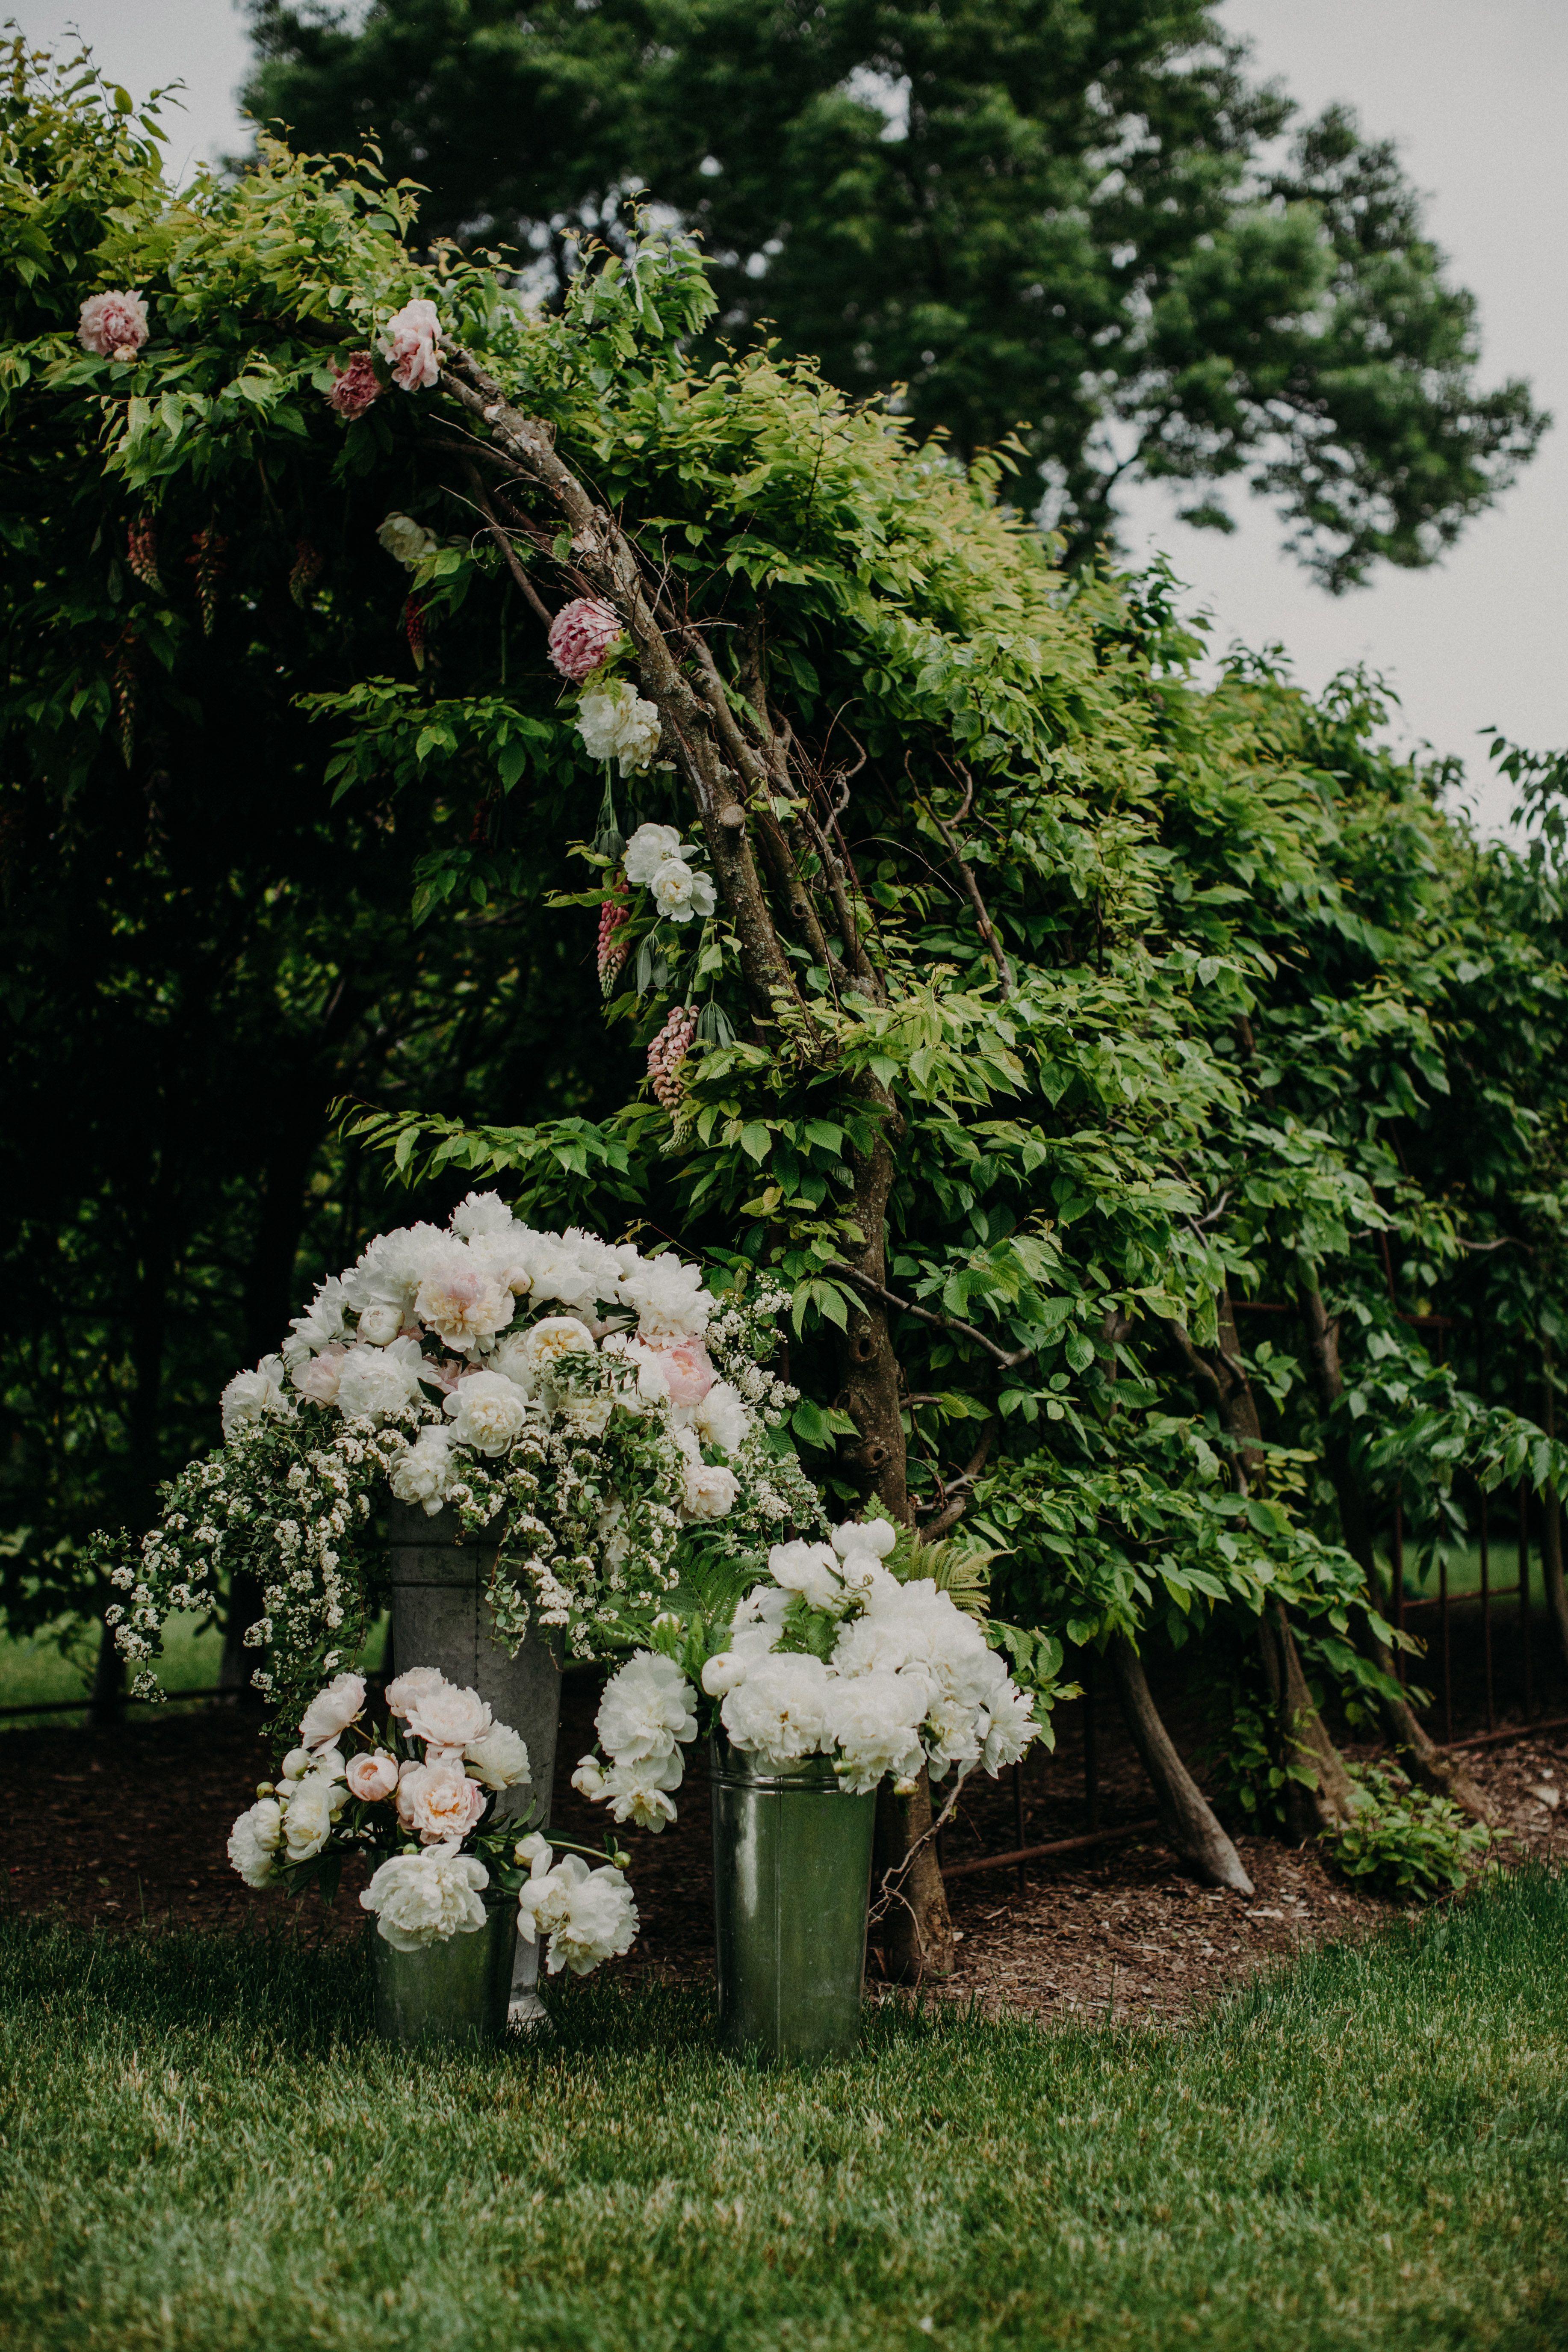 20 Stunning Rustic Wedding Ideas - Decorations for a Rustic Wedding